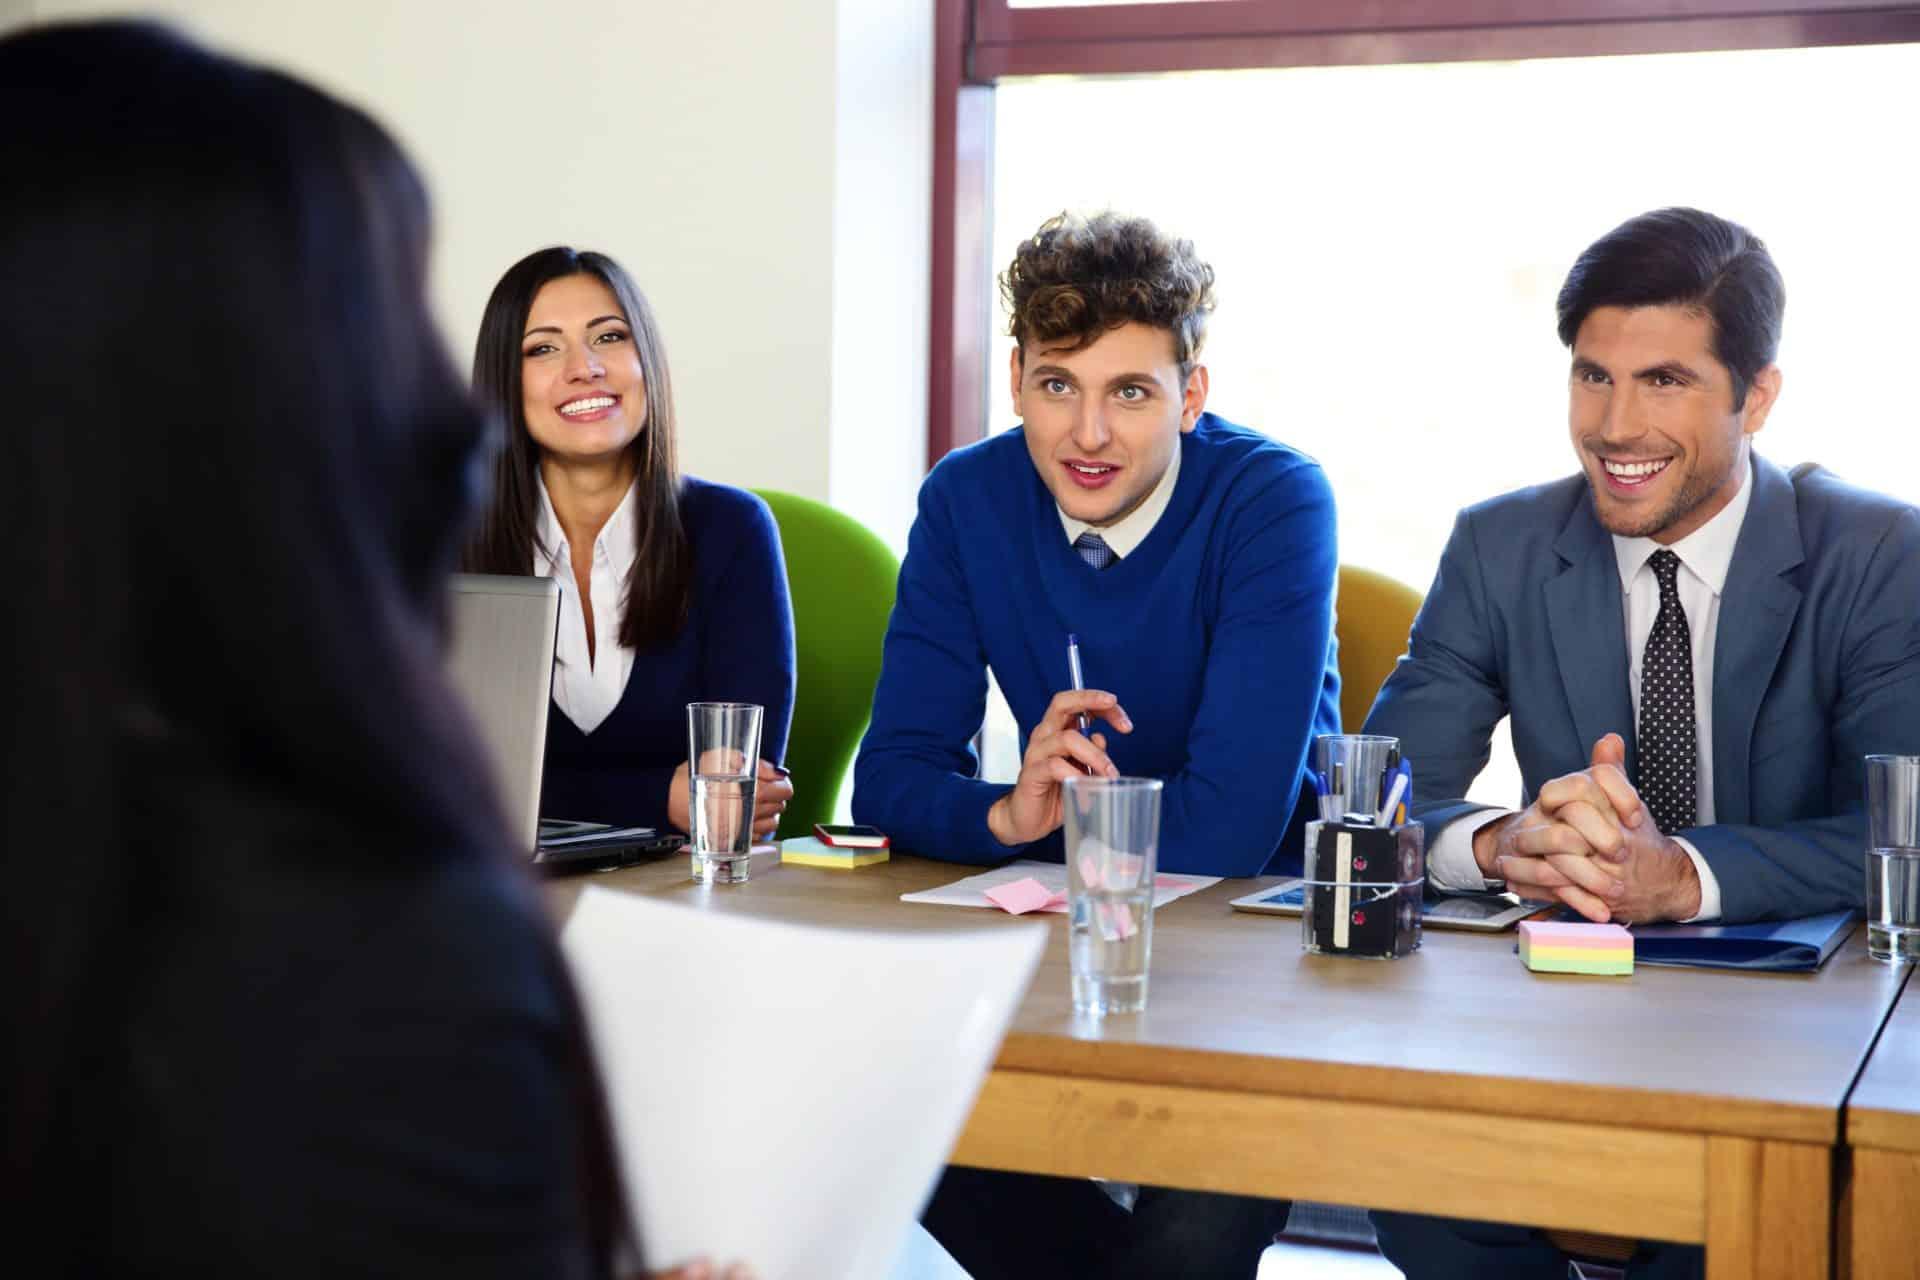 seleccion de personal cono consultores